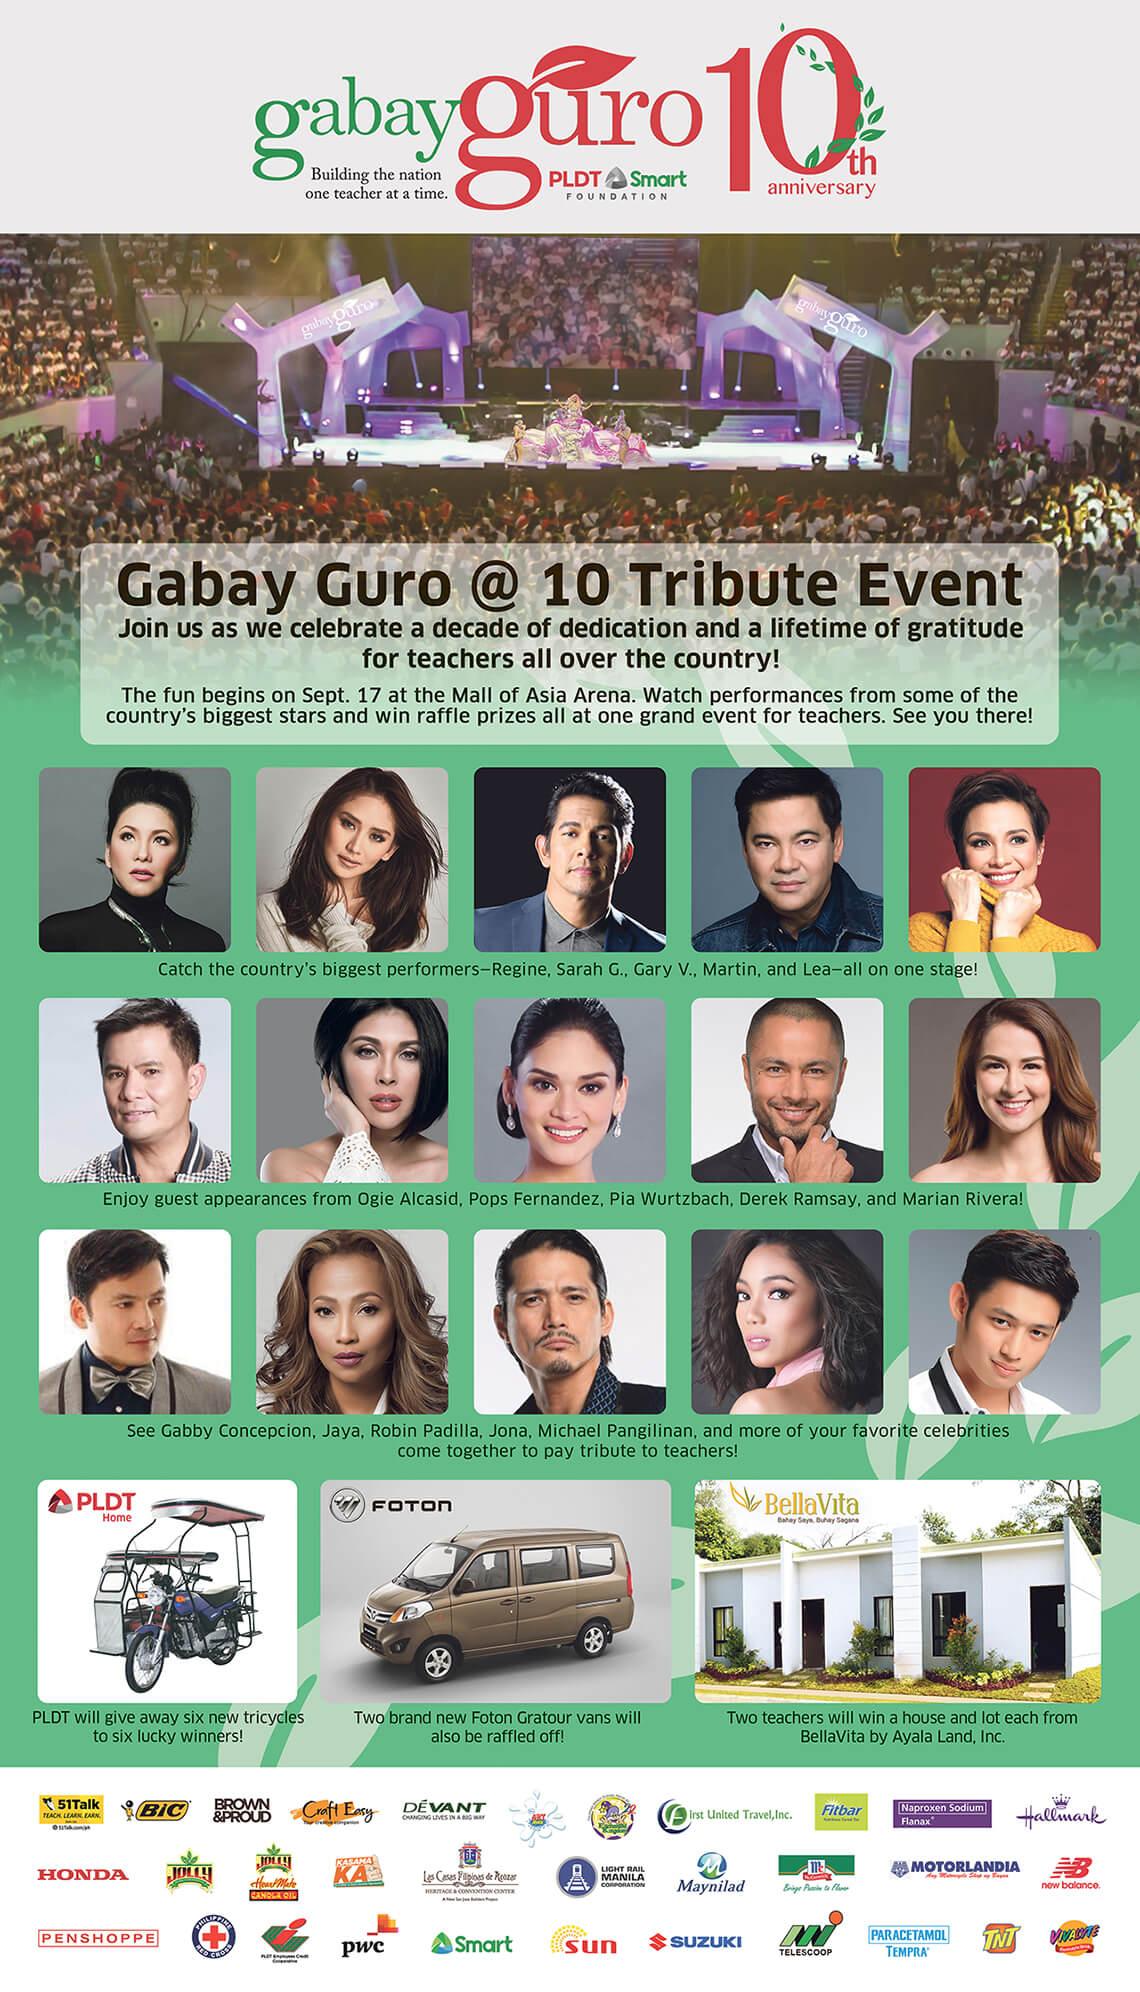 Gabay Guro @ 10 Tribute Event